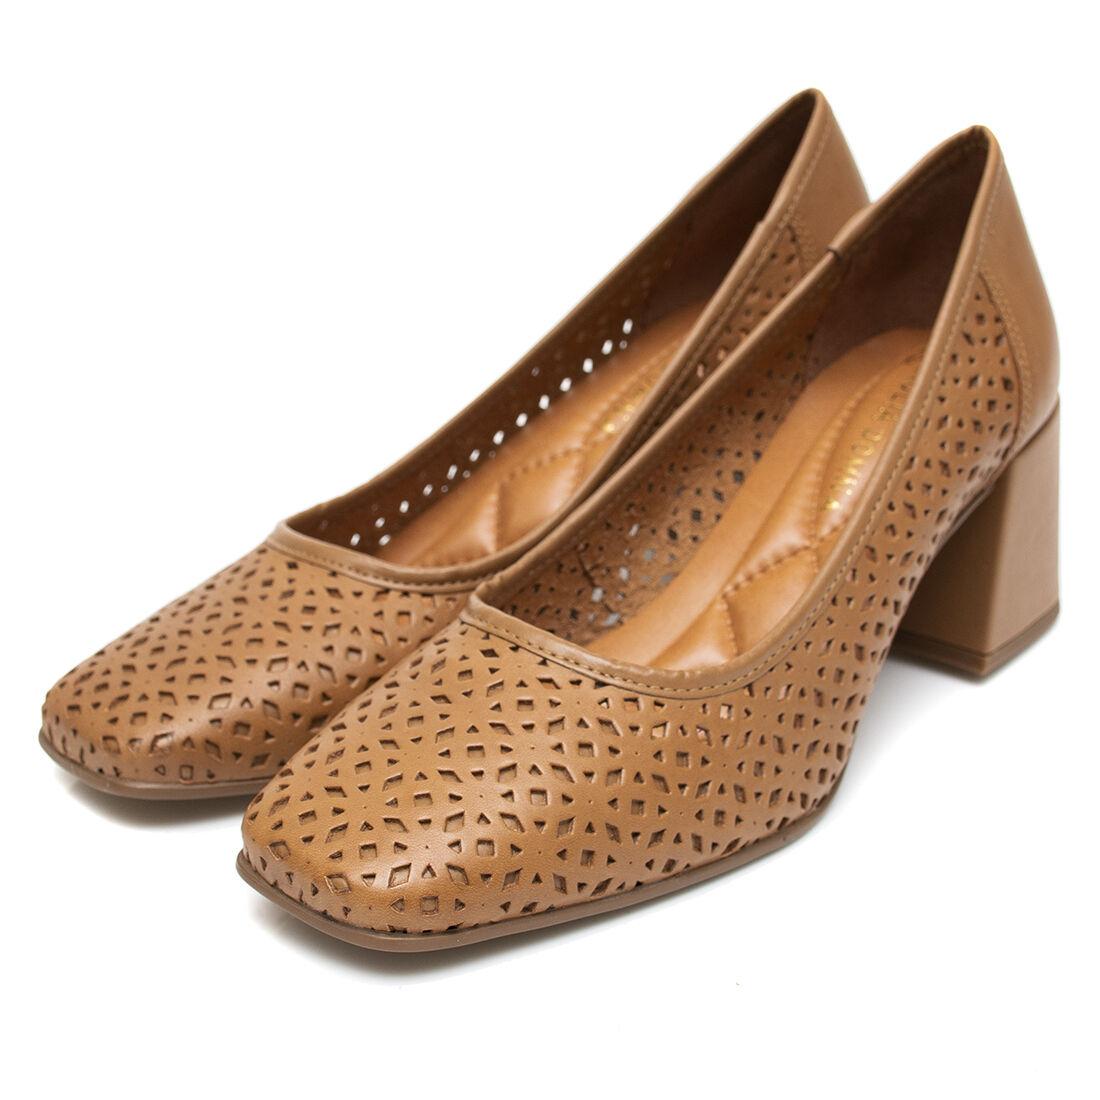 Sapato Giulia Domna em Couro Recorte a Laser Caramelo